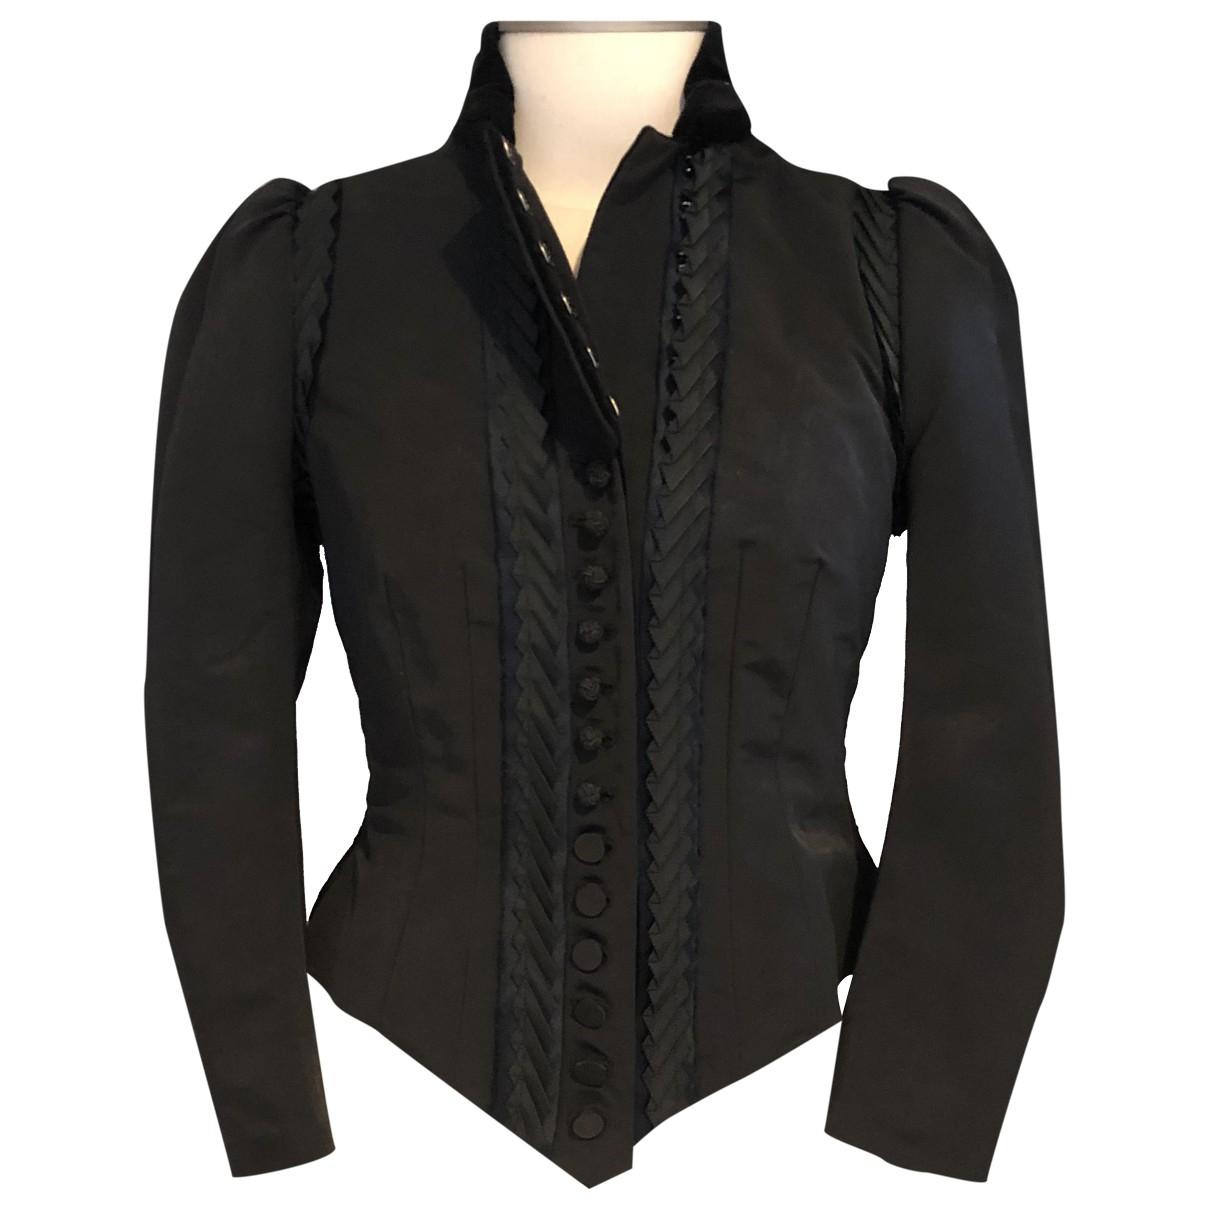 3.1 Phillip Lim \N Black jacket for Women 2 US